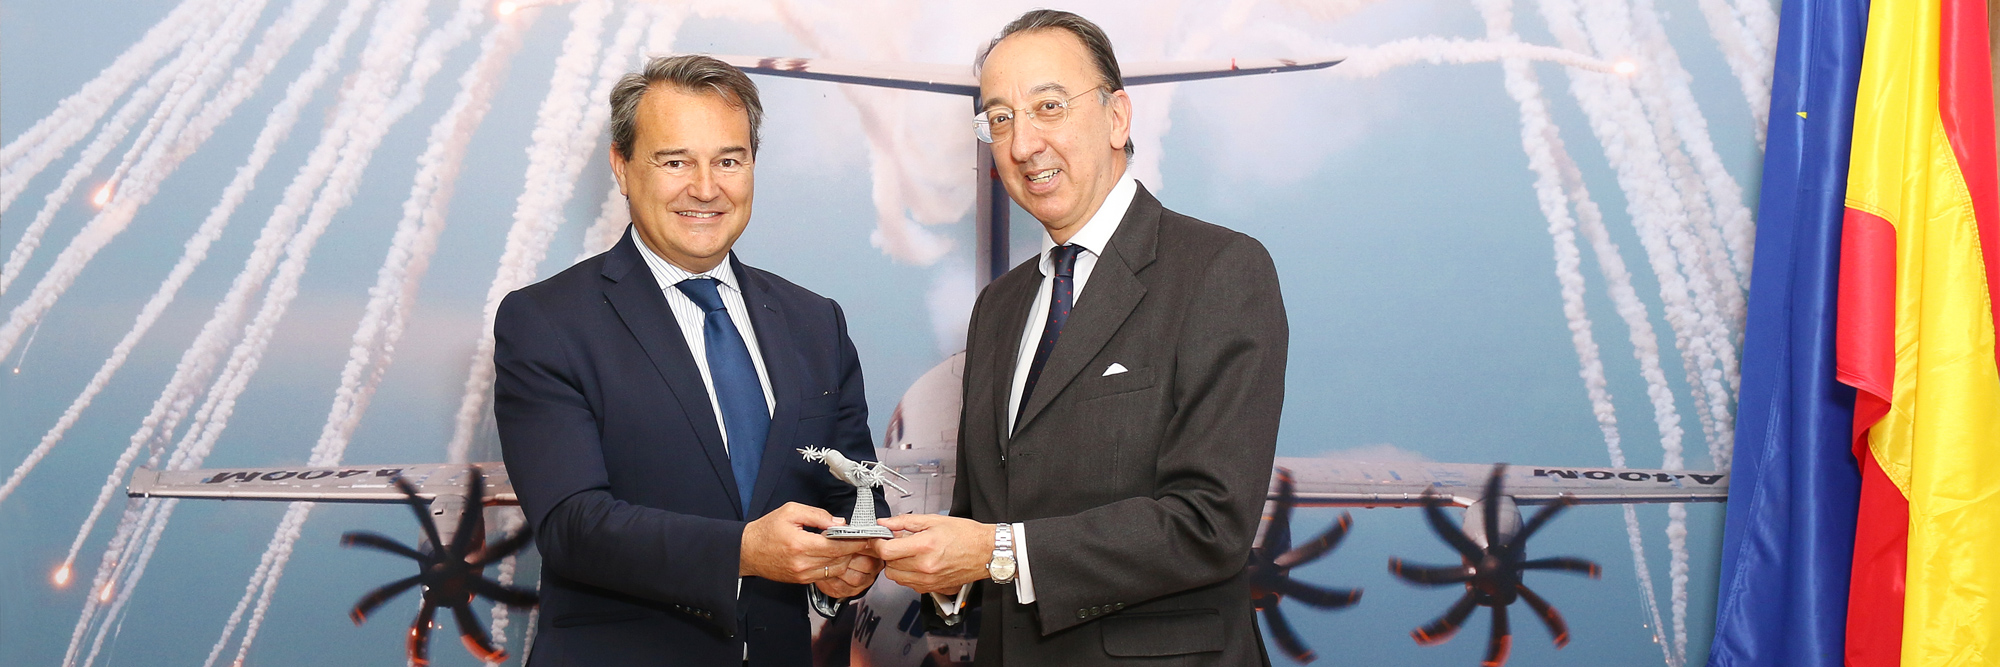 Spanish Secretary of State visits EDA